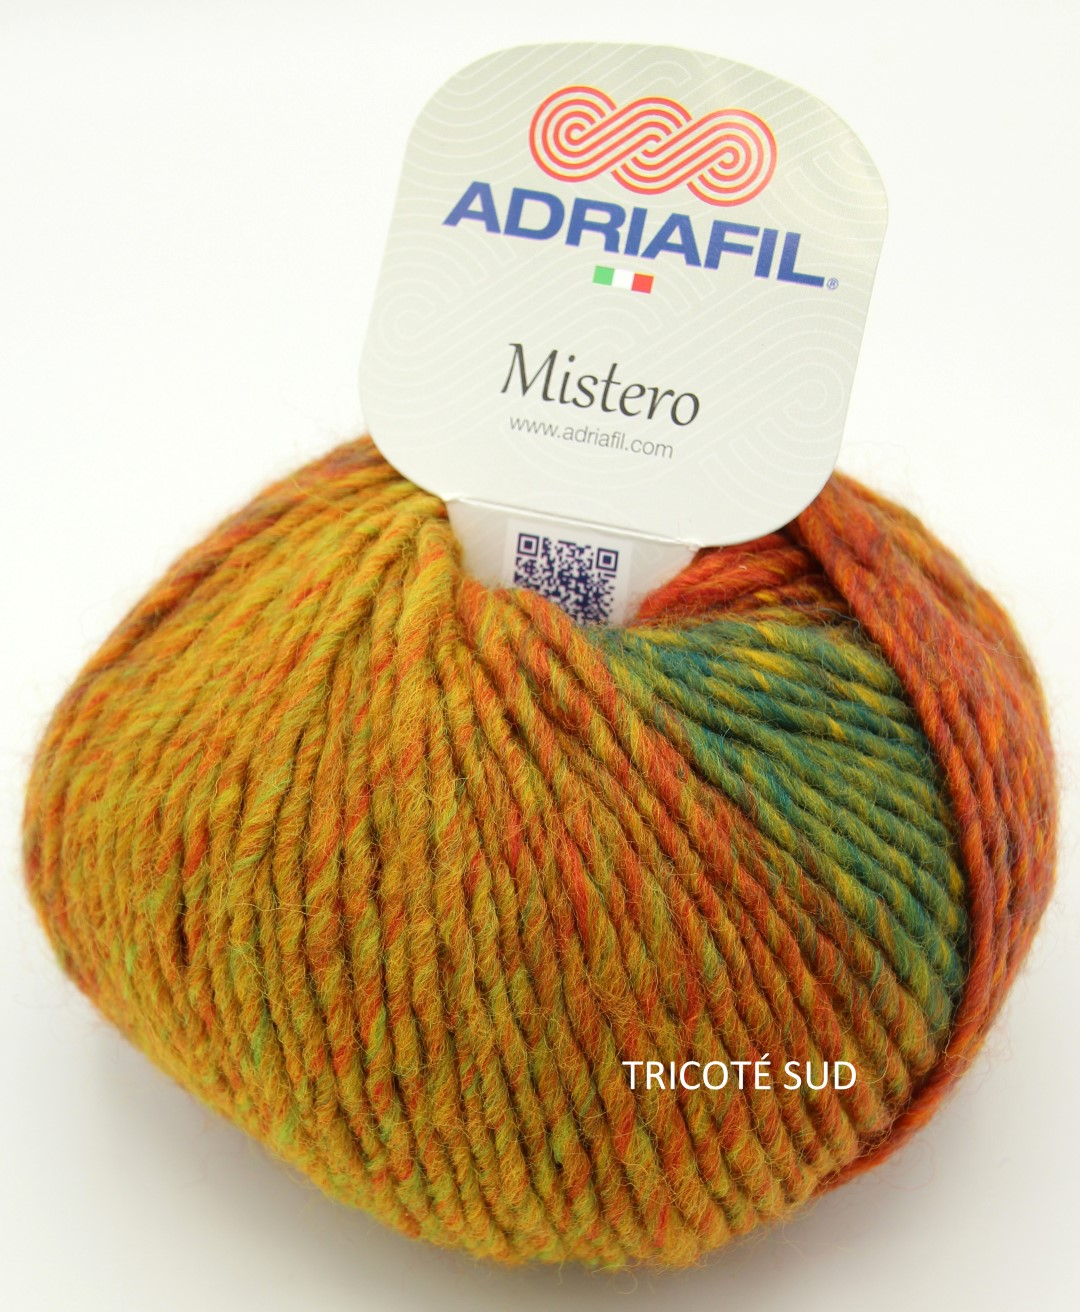 MISTERO ADRIAFIL COLORIS 51 (2) (Large)